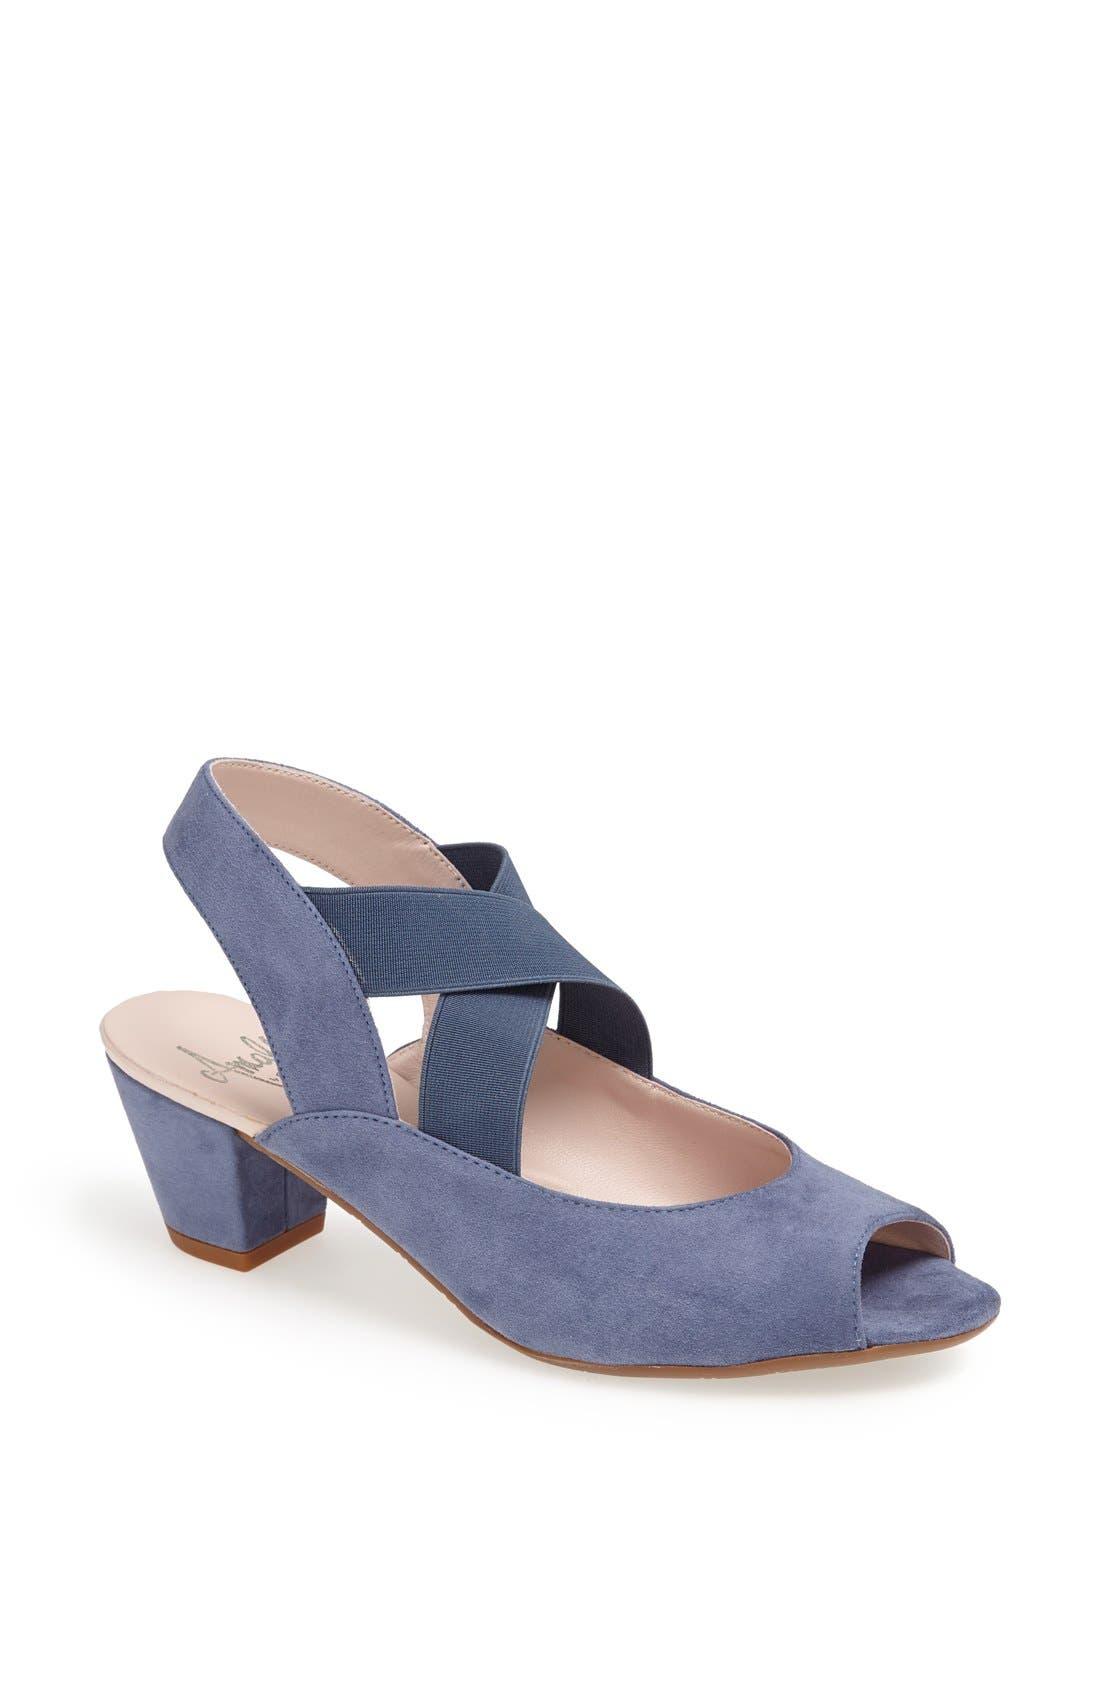 Main Image - Amalfi by Rangoni 'Varese' Sandal